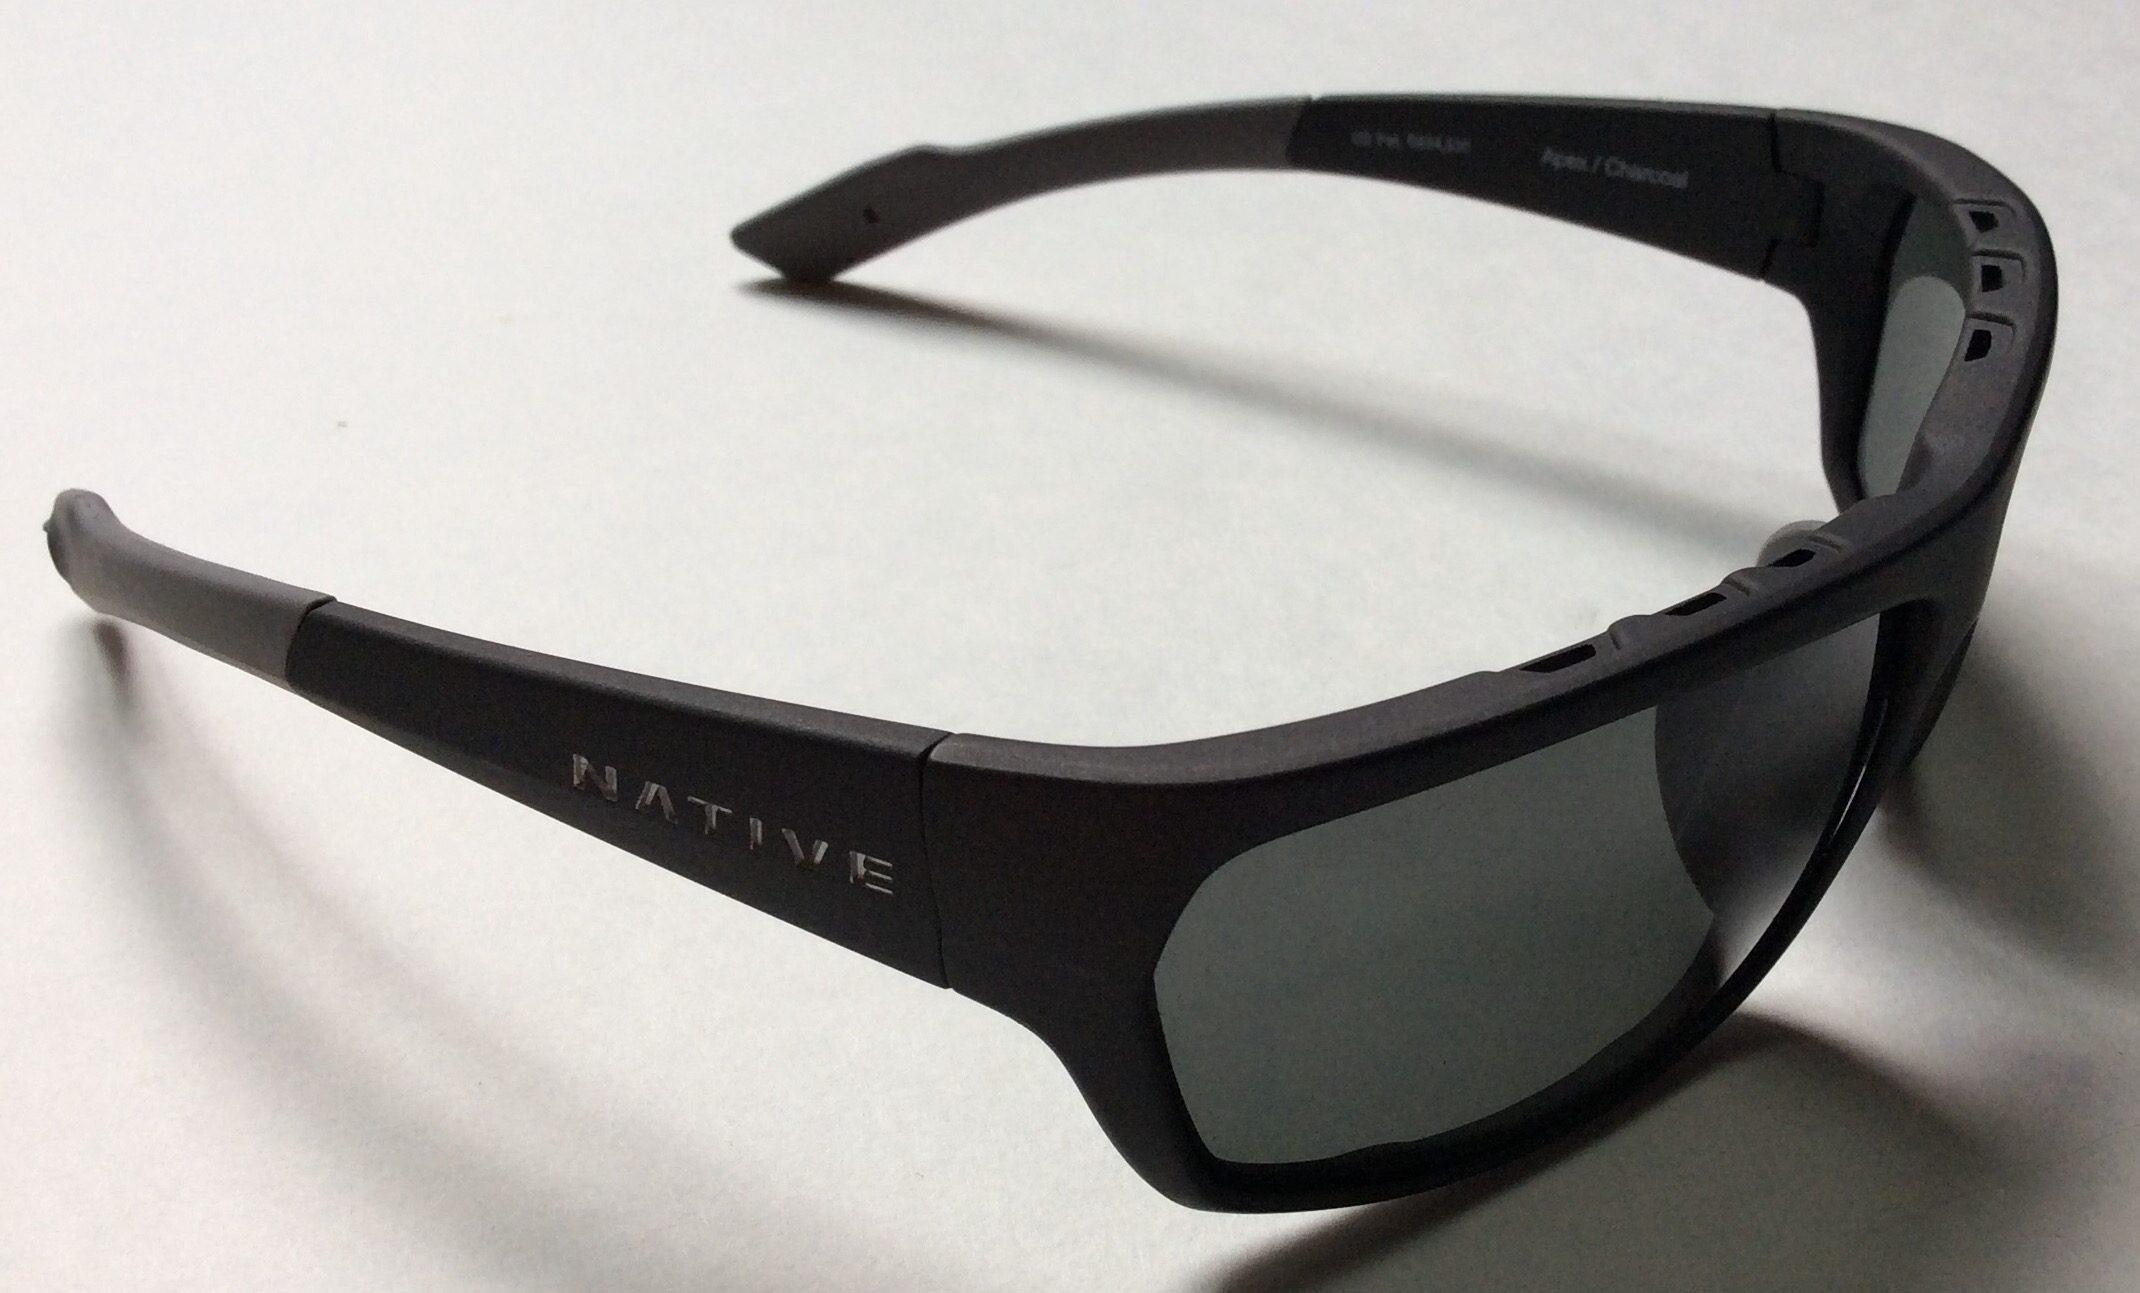 eeec7e38a05 Native Zodiac Sunglasses Reviews - Bitterroot Public Library